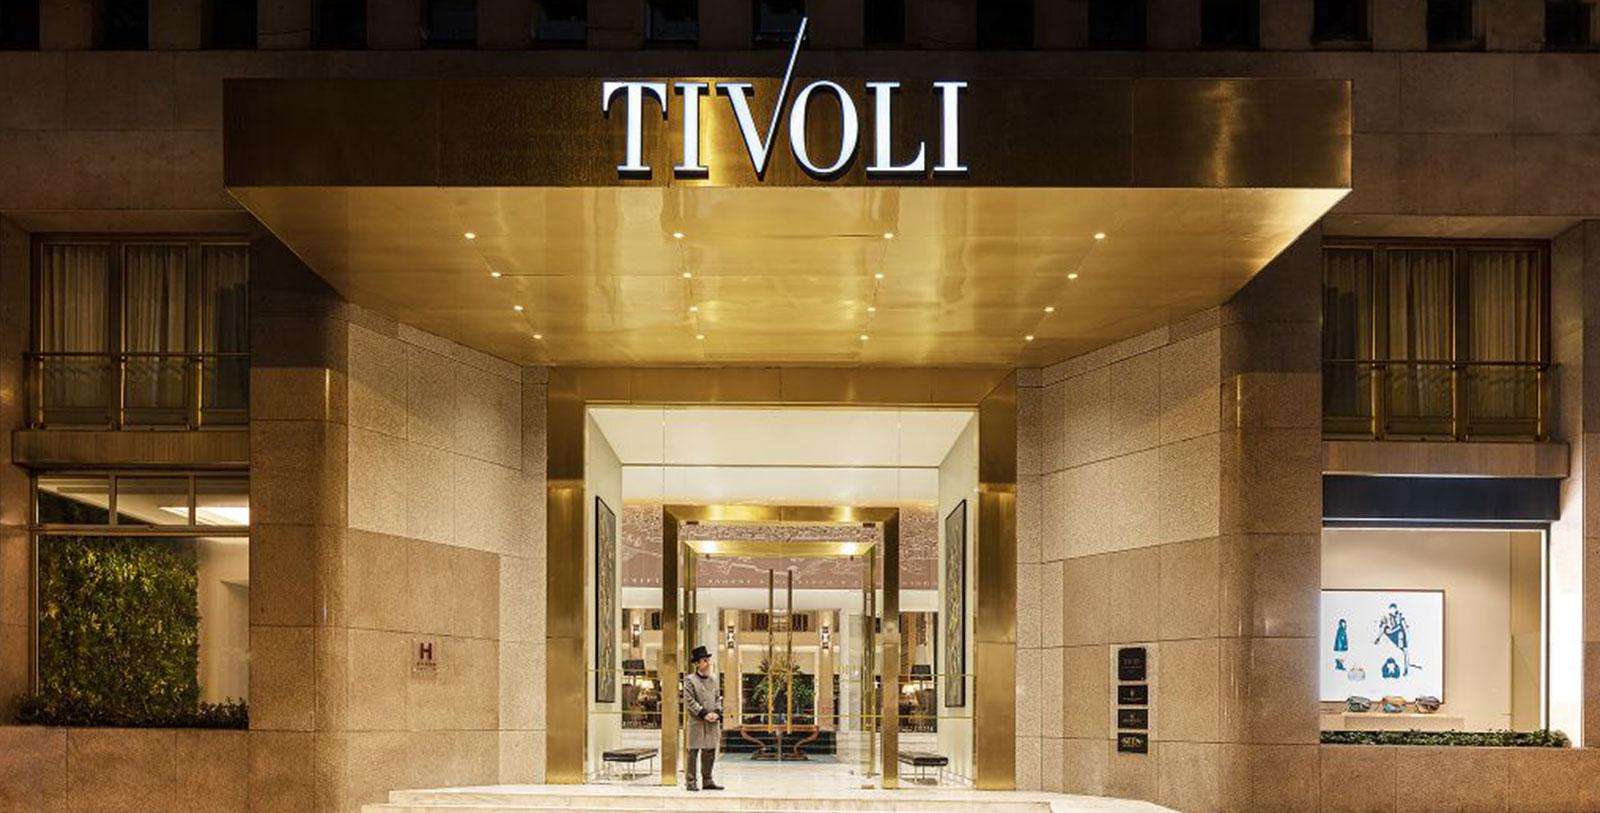 Image of Hotel Front Entrance at Tivoli Avenida Liberdade Lisboa, 1933, Member of Historic Hotels Worldwide, in Lisbon, Portugal, Overview